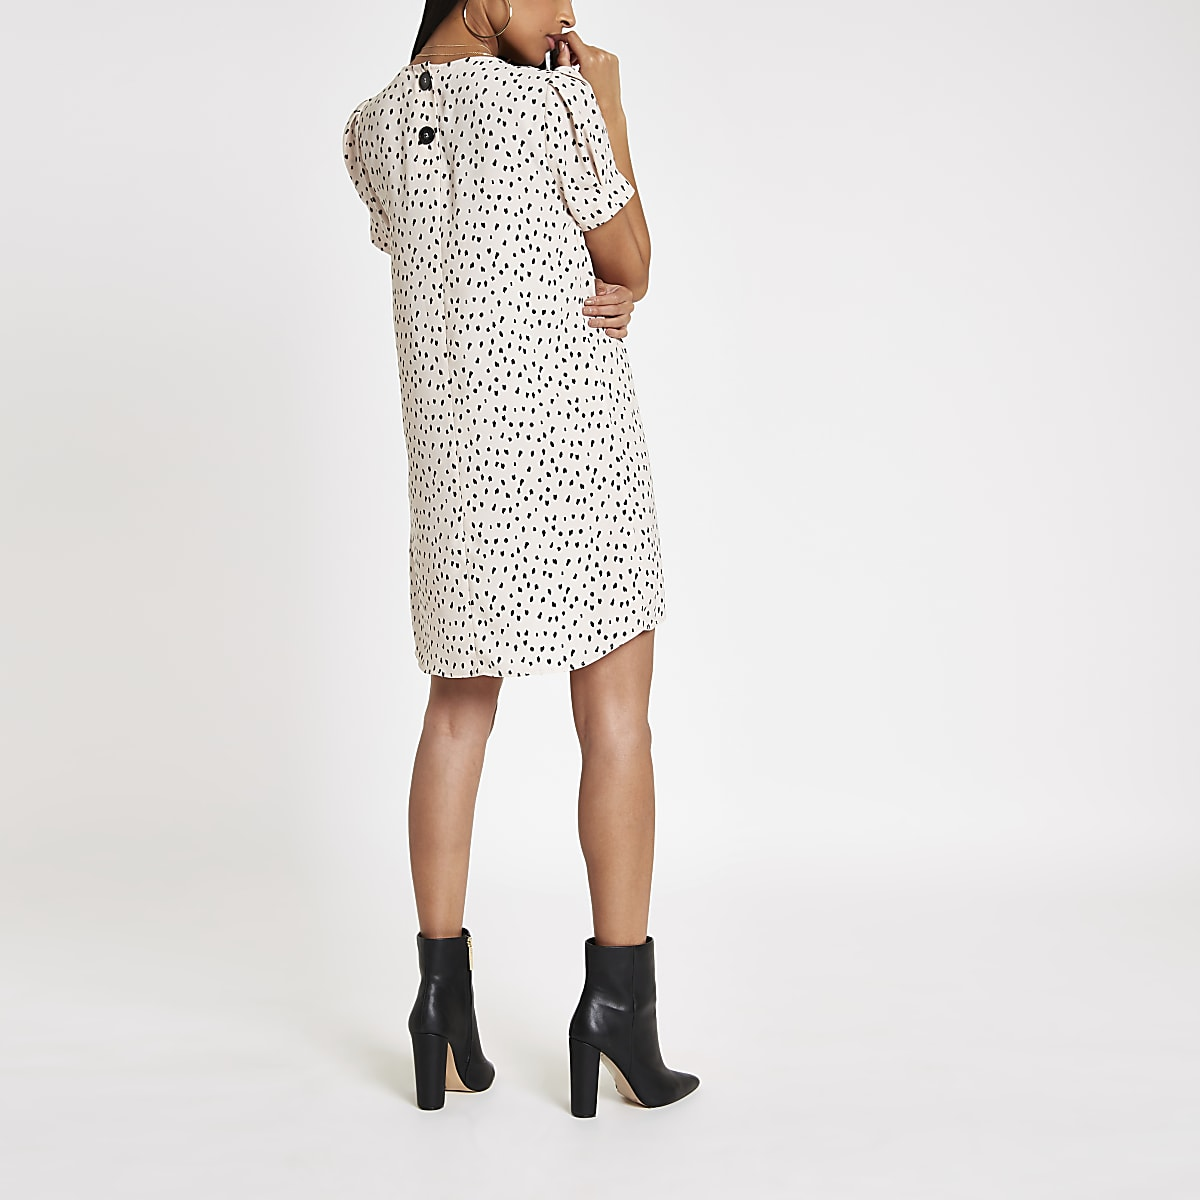 6326f857893 White leopard print swing dress - Swing Dresses - Dresses - women